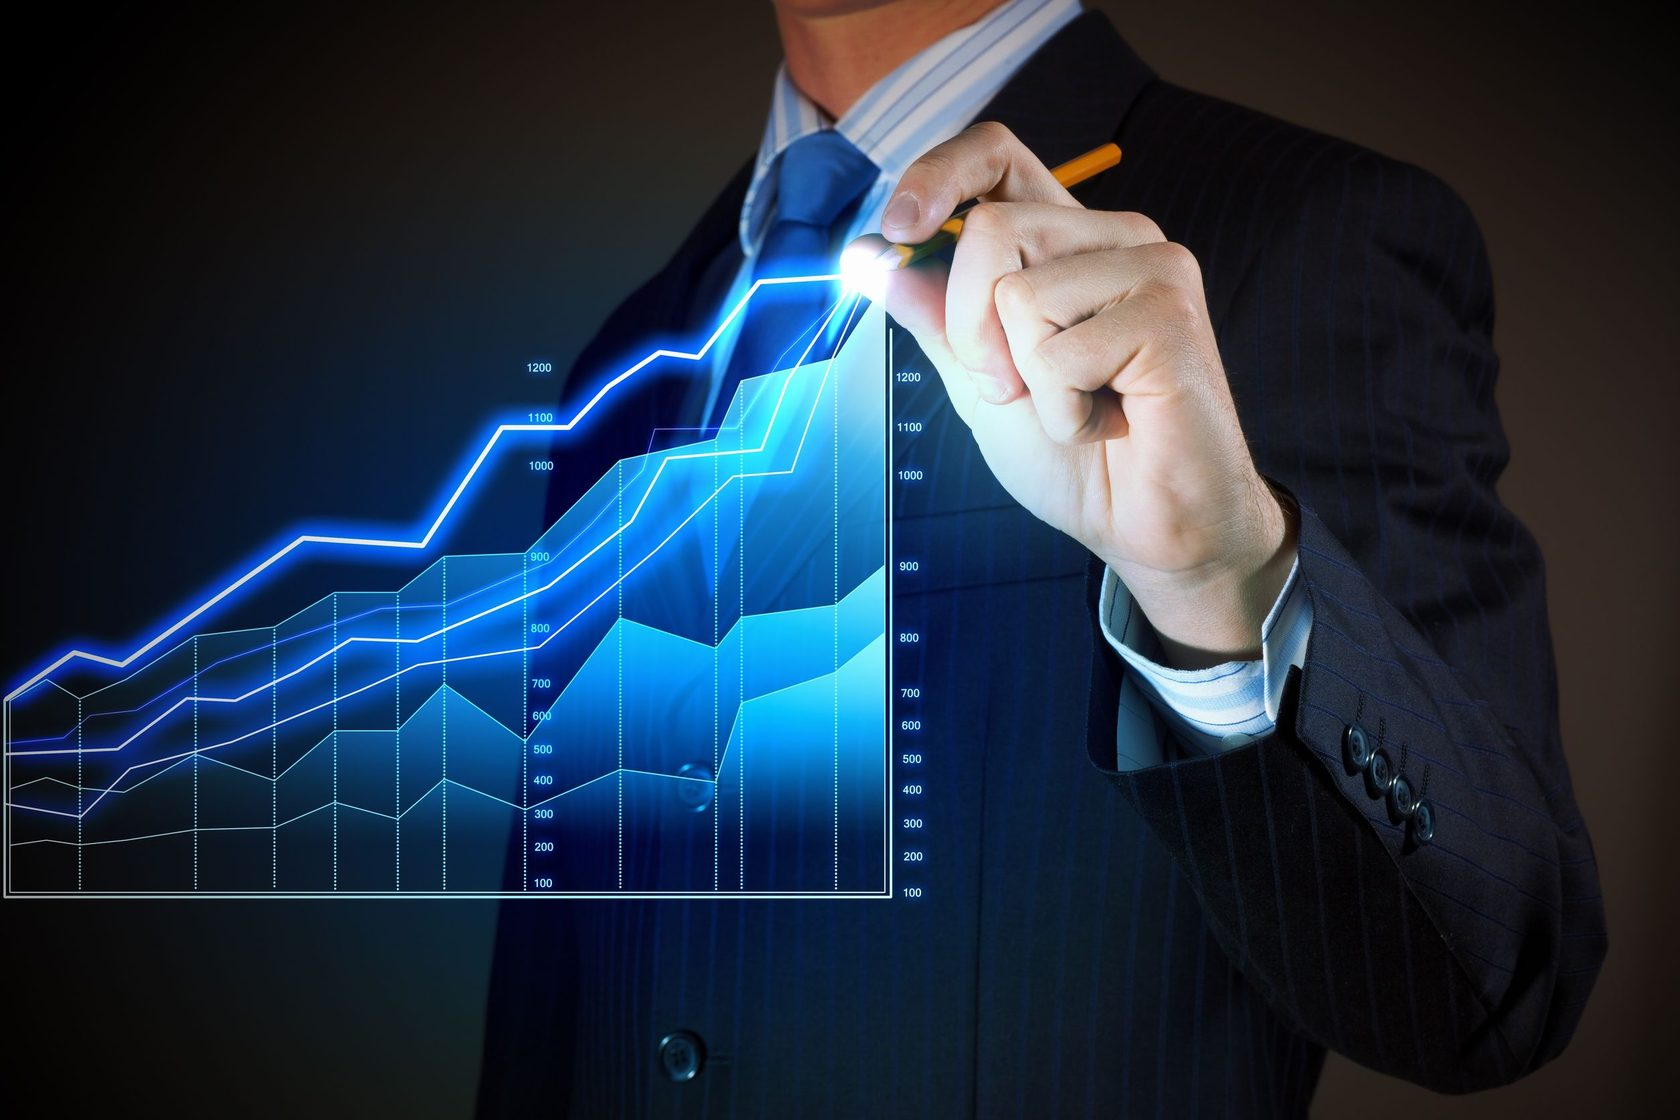 investing_oshibki1 Грамотность в инвестициях через интернет